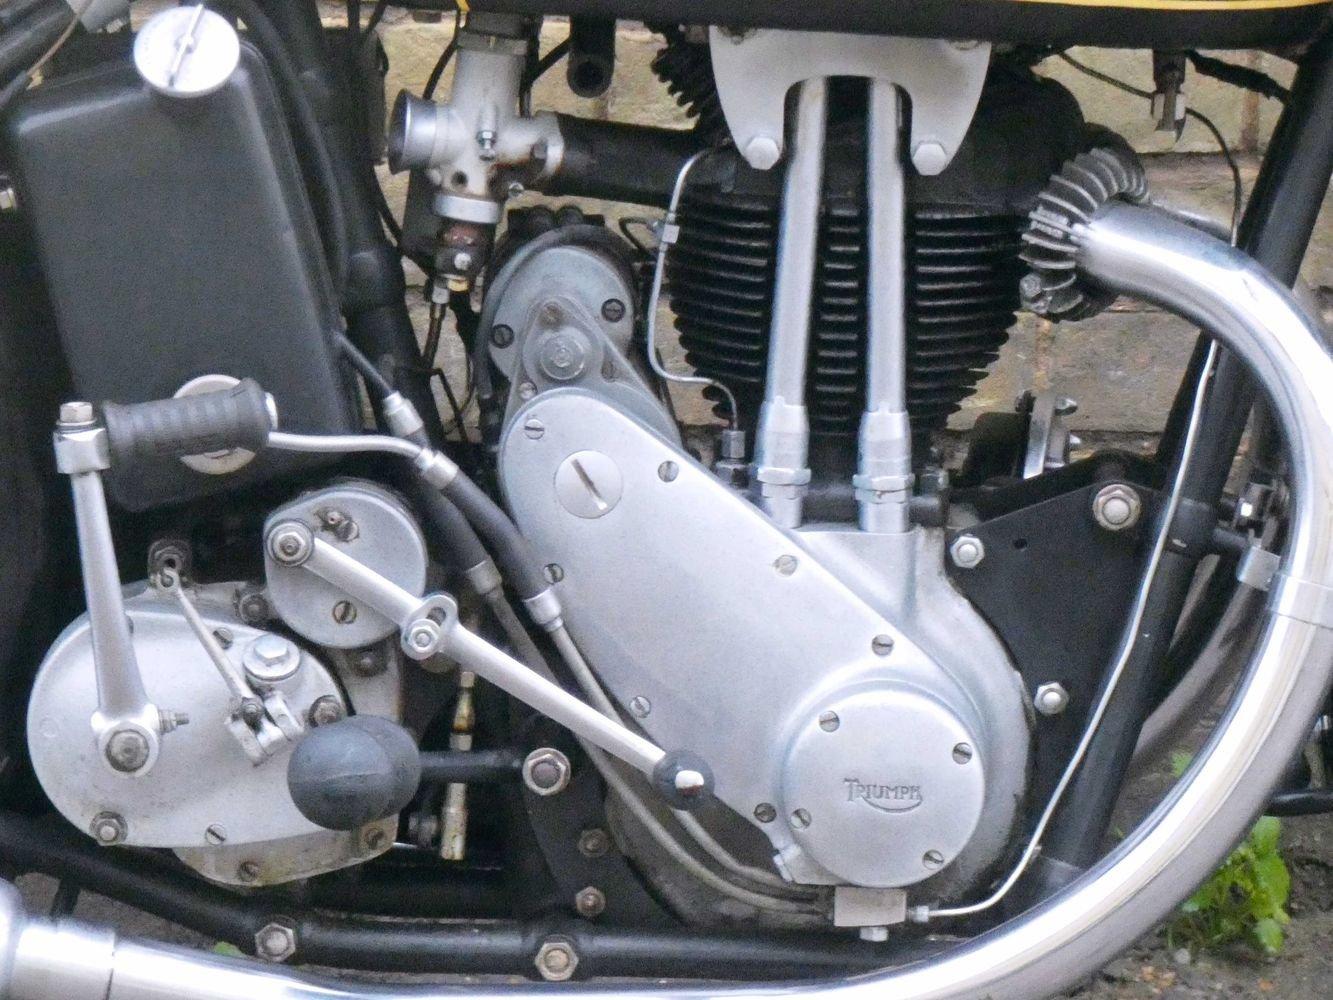 1935 Triumph Model 5/2 500cc For Sale (picture 3 of 6)